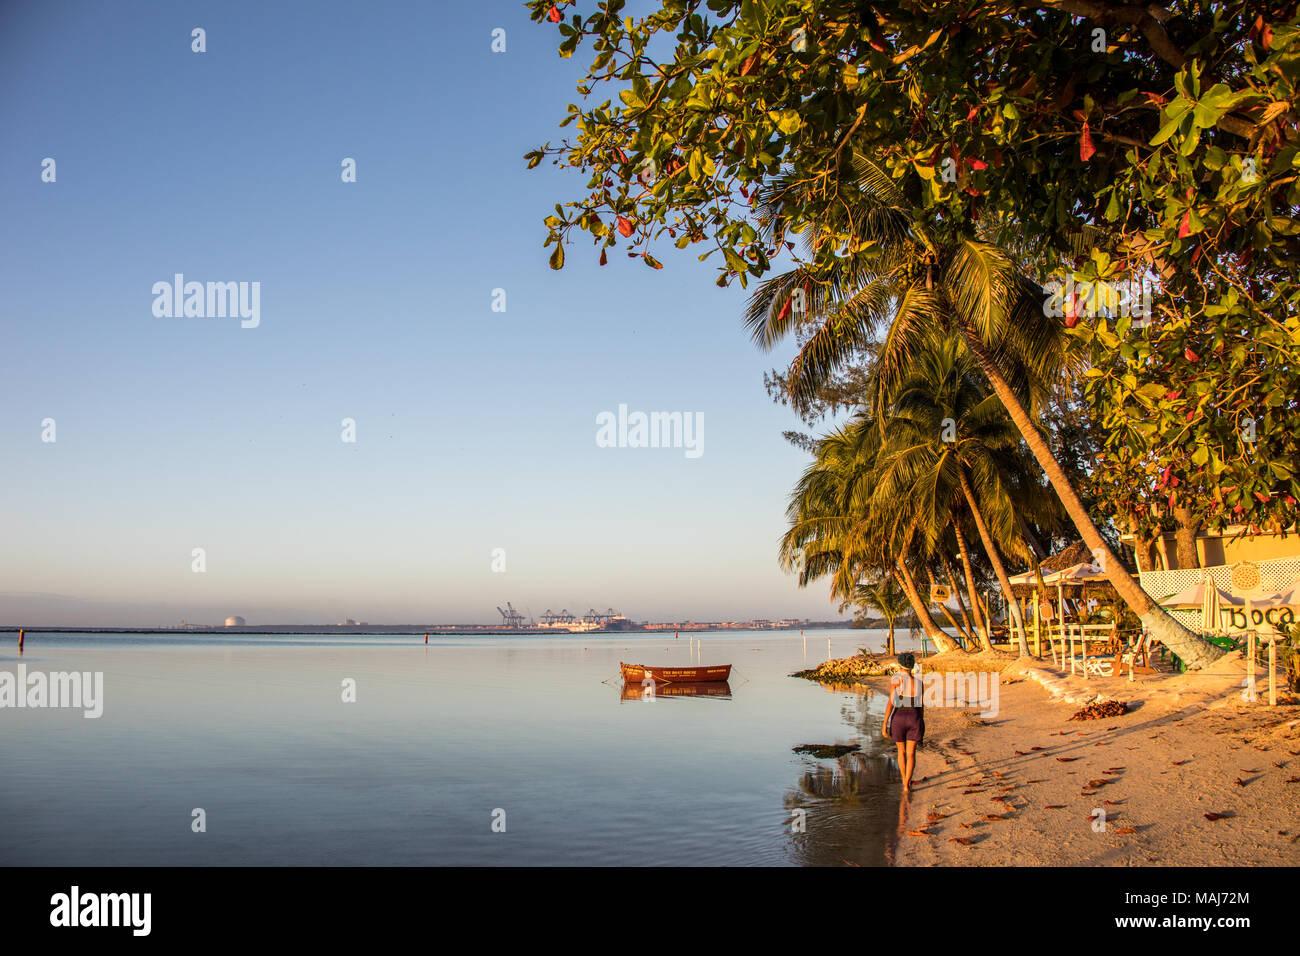 Playa Pública Boca Chica, Boca China, Domnican Republic - Stock Image